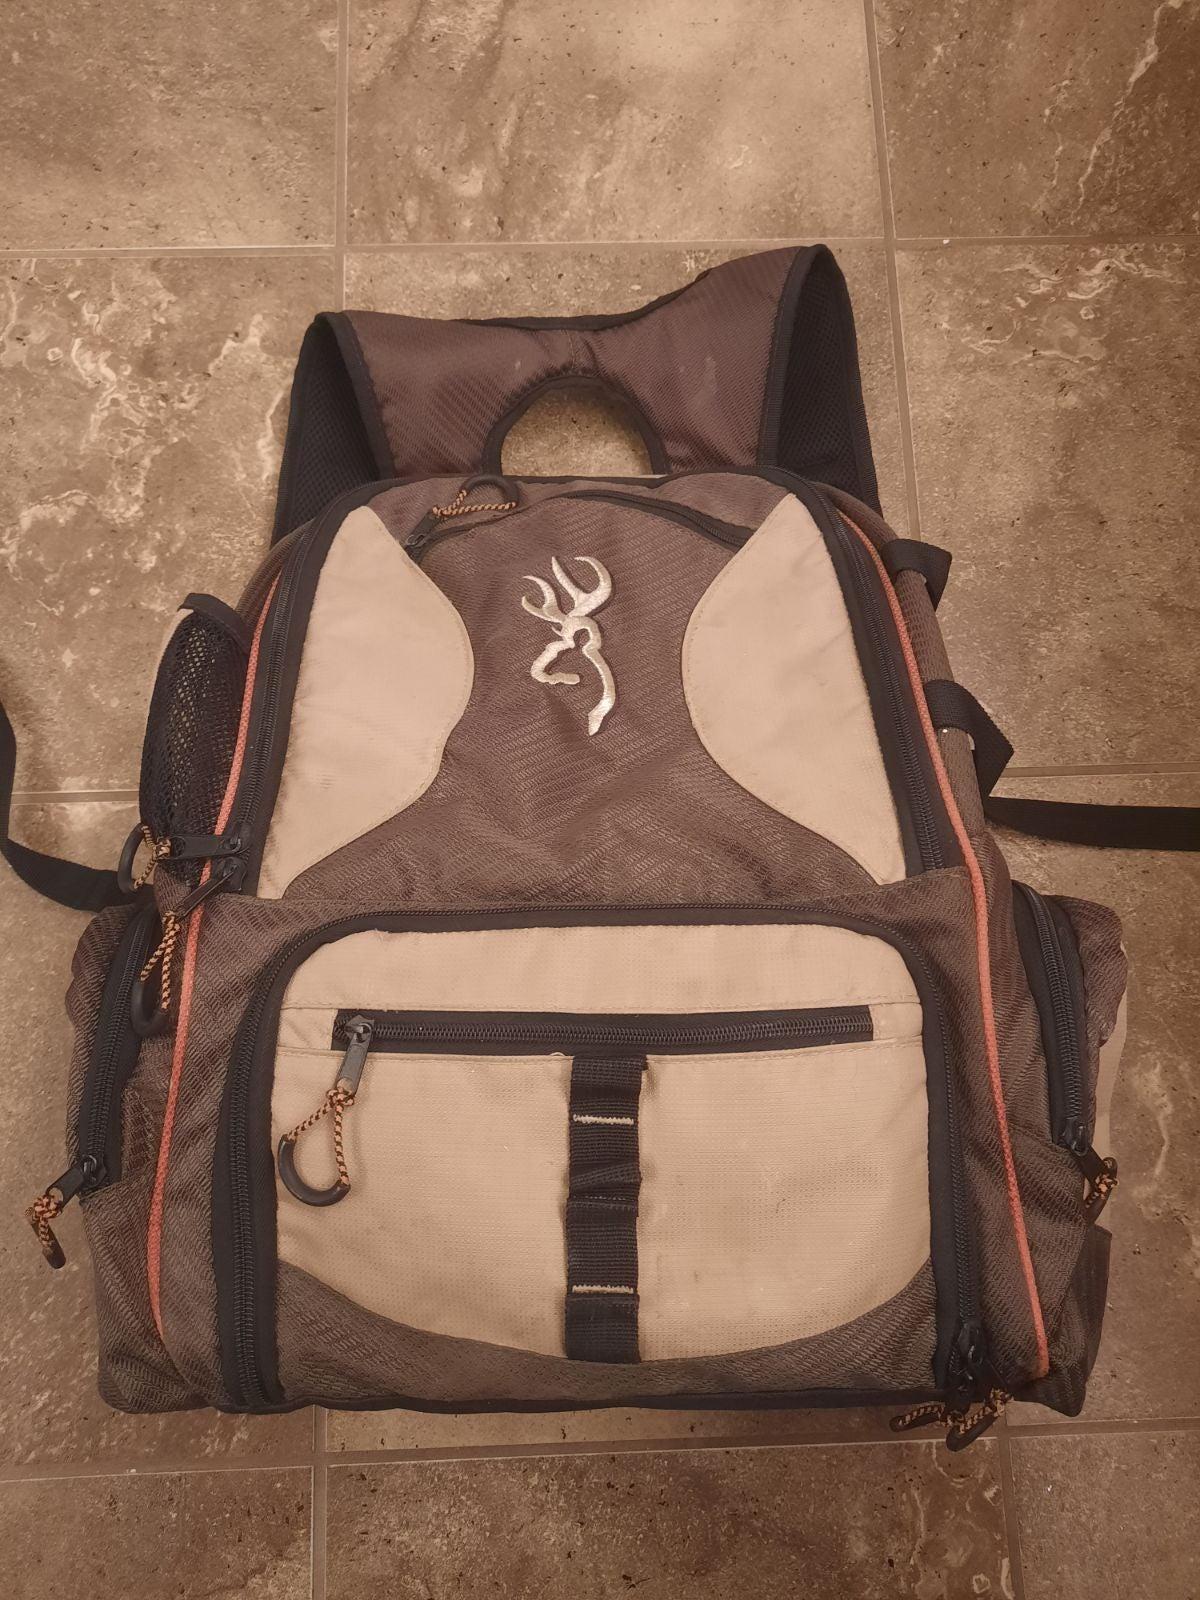 Browning fishing backpack